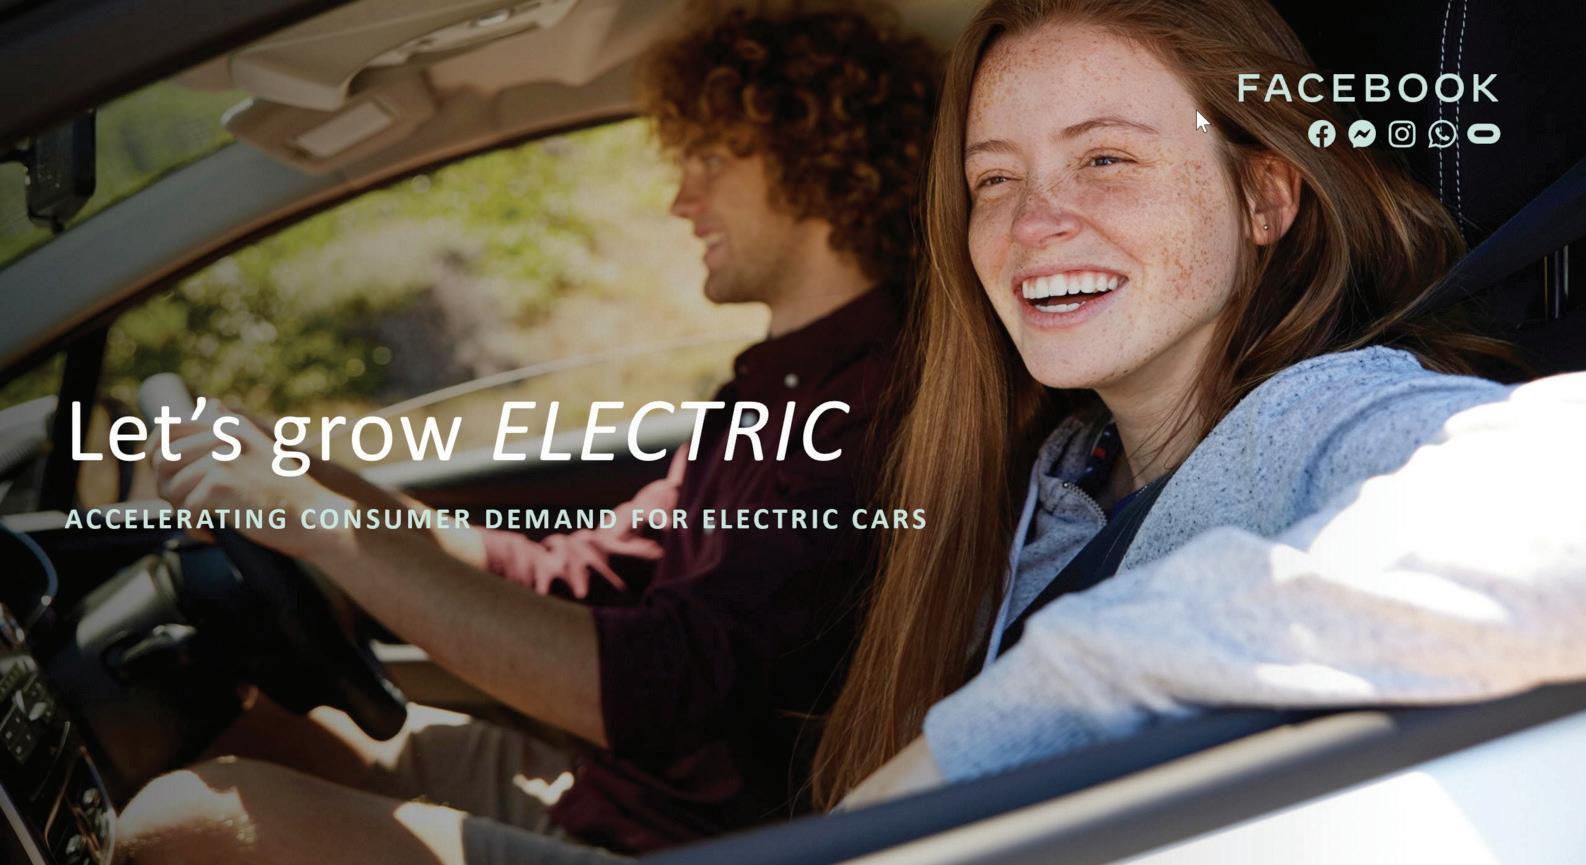 Page 23 of Let's Grow ELECTRIC Έρευνα καταναλωτών ηλεκτρικών οχημάτων στο Ηνωμένο Βασίλειο